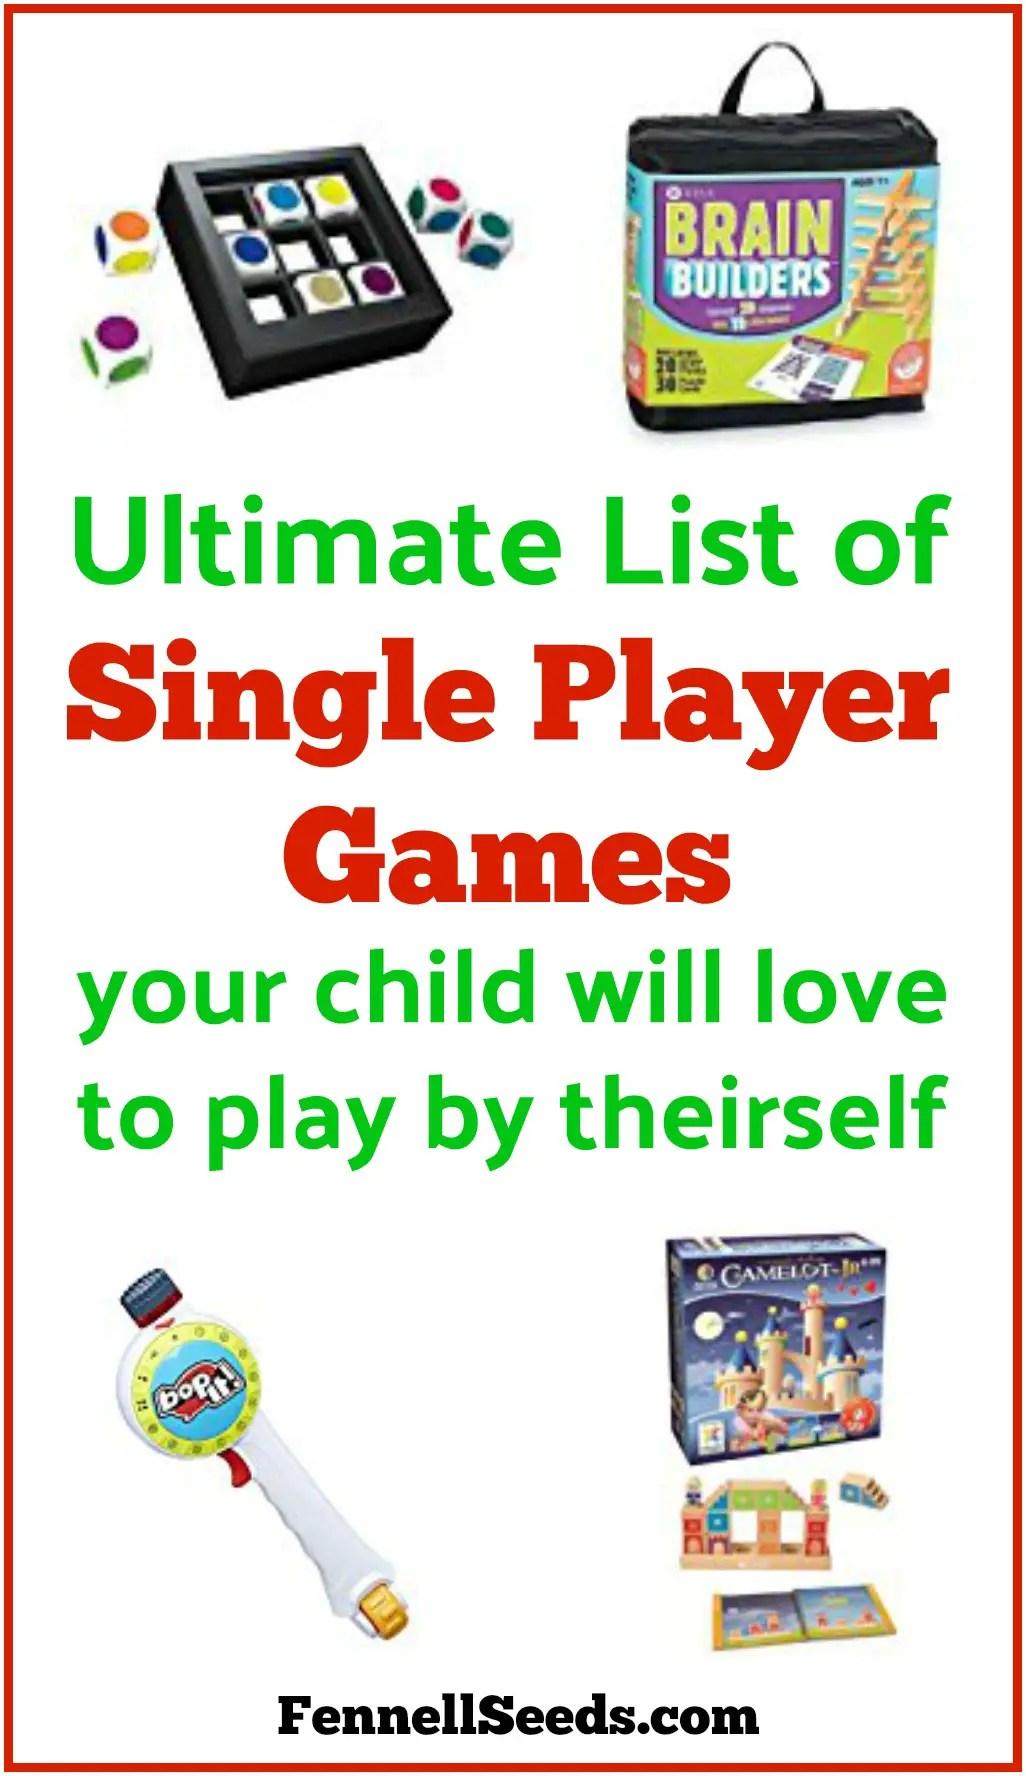 flirting games ggg 3 download free movie